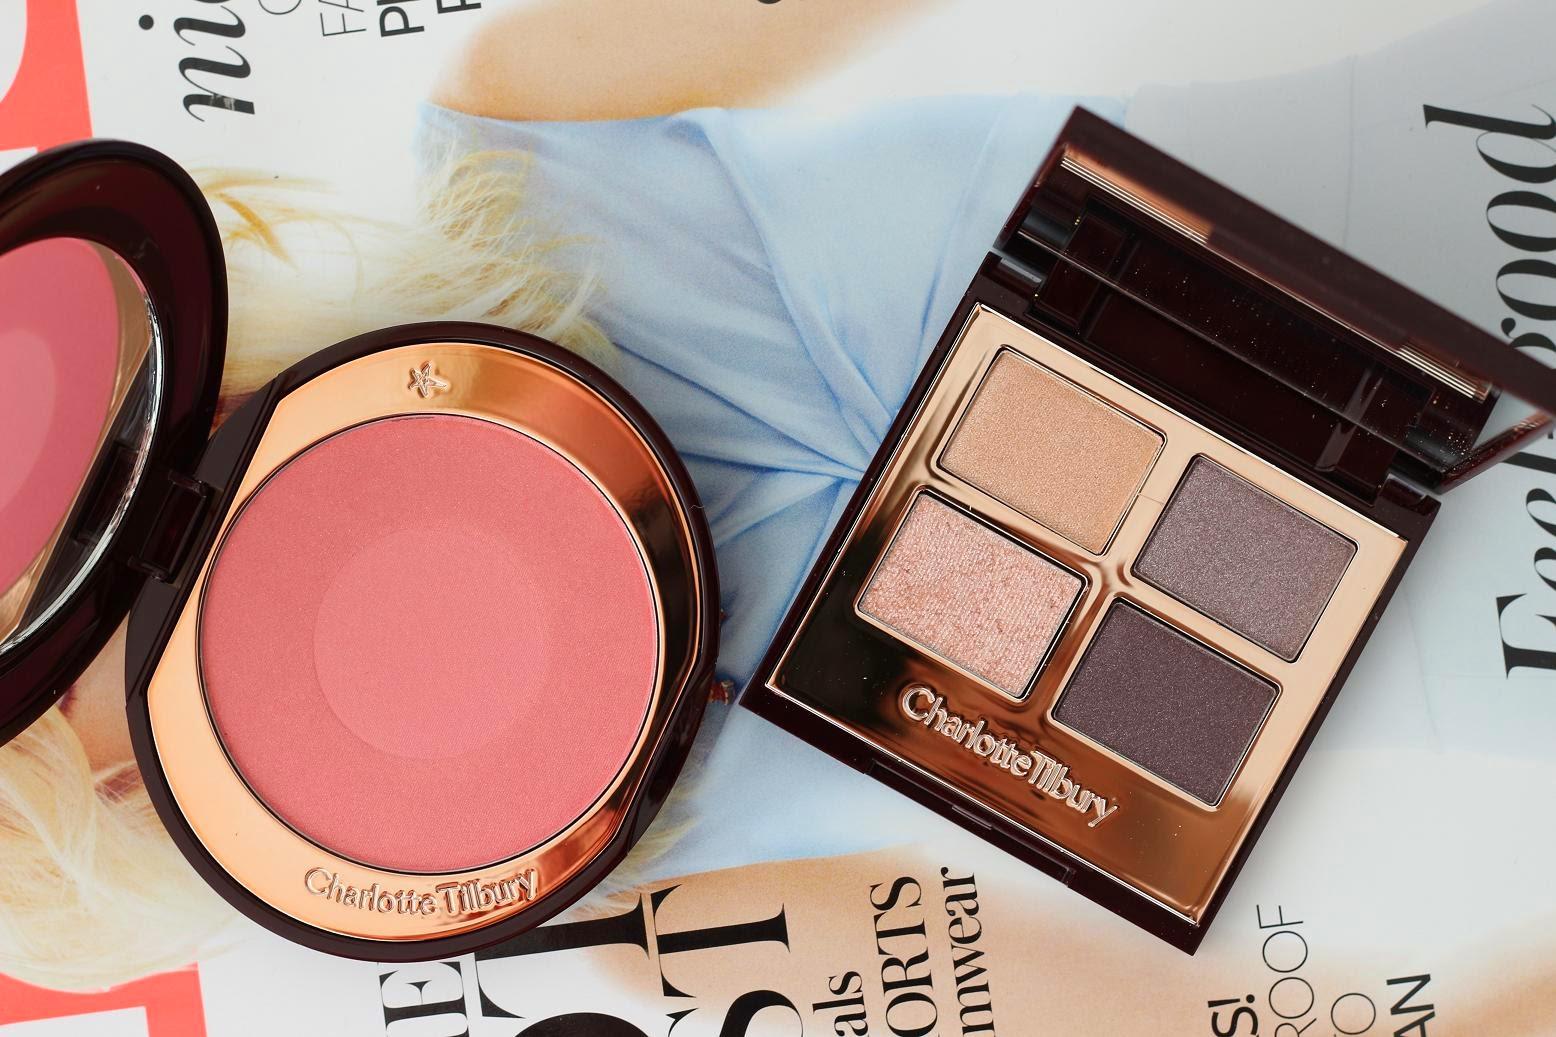 Charlotte Tilbury Luxury Palette - Cheek to Chic